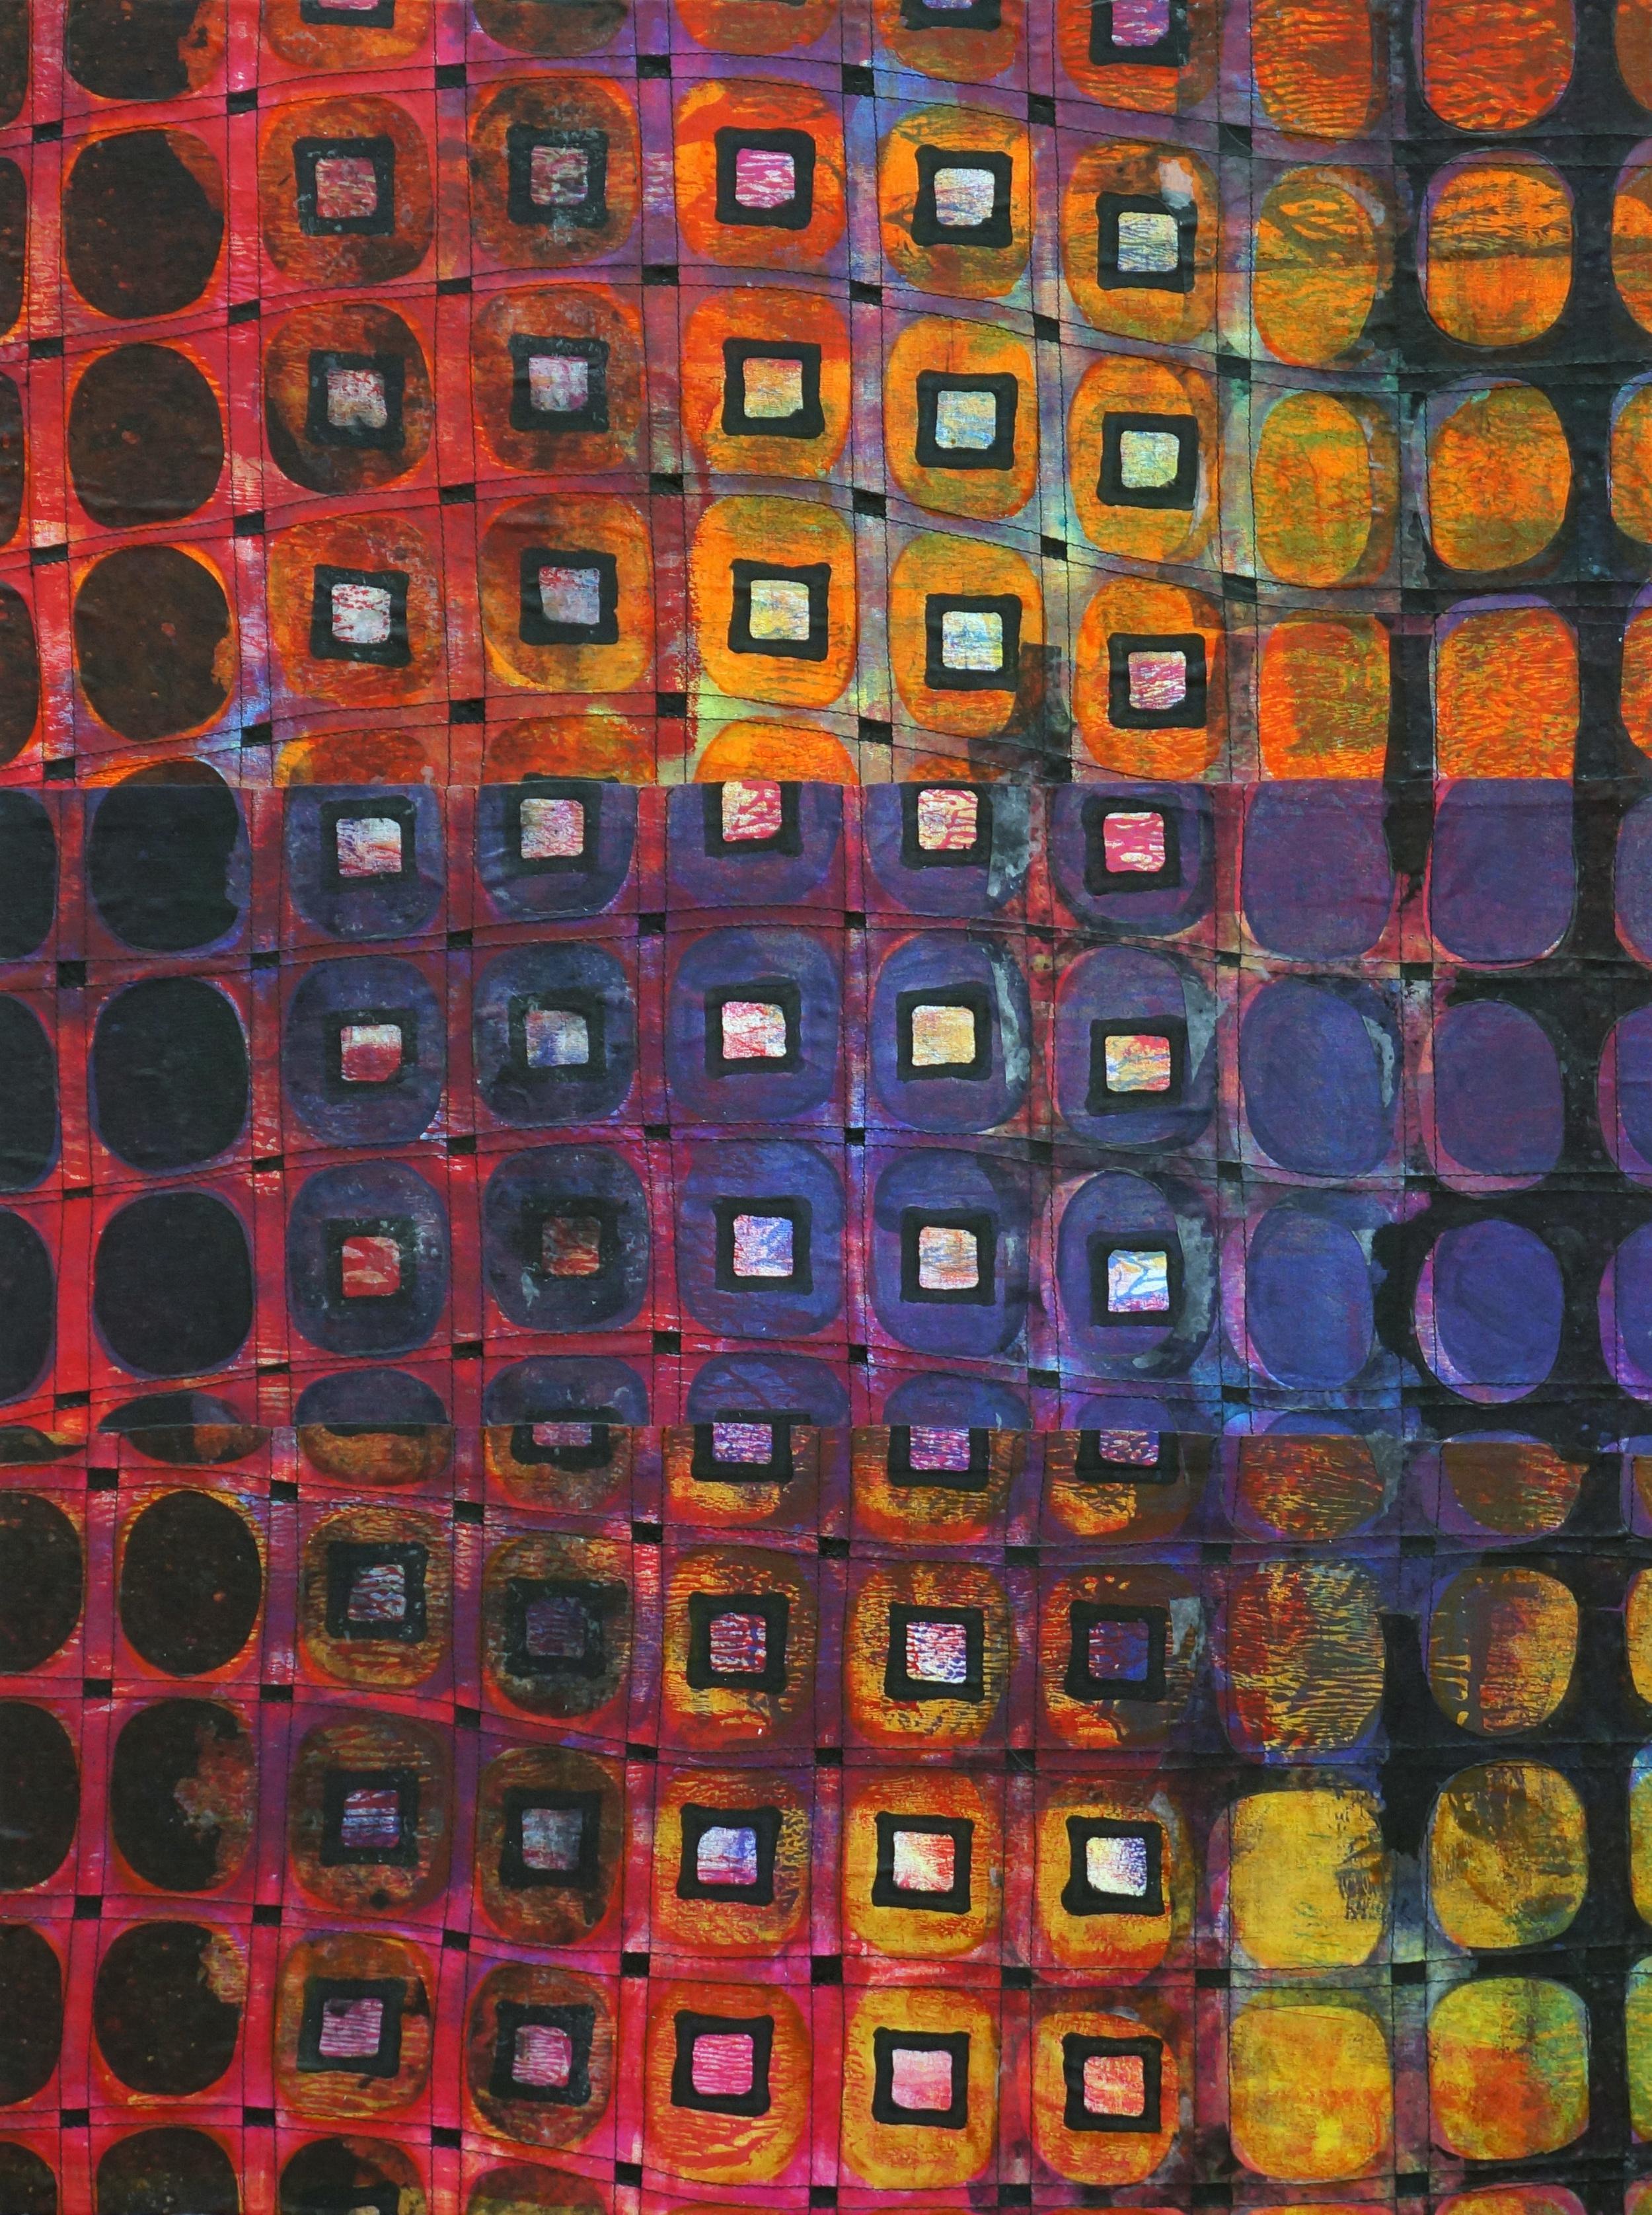 Jeanne Williamson, Street Ice on Fences #1 , mixed media on cradled board, 24x18